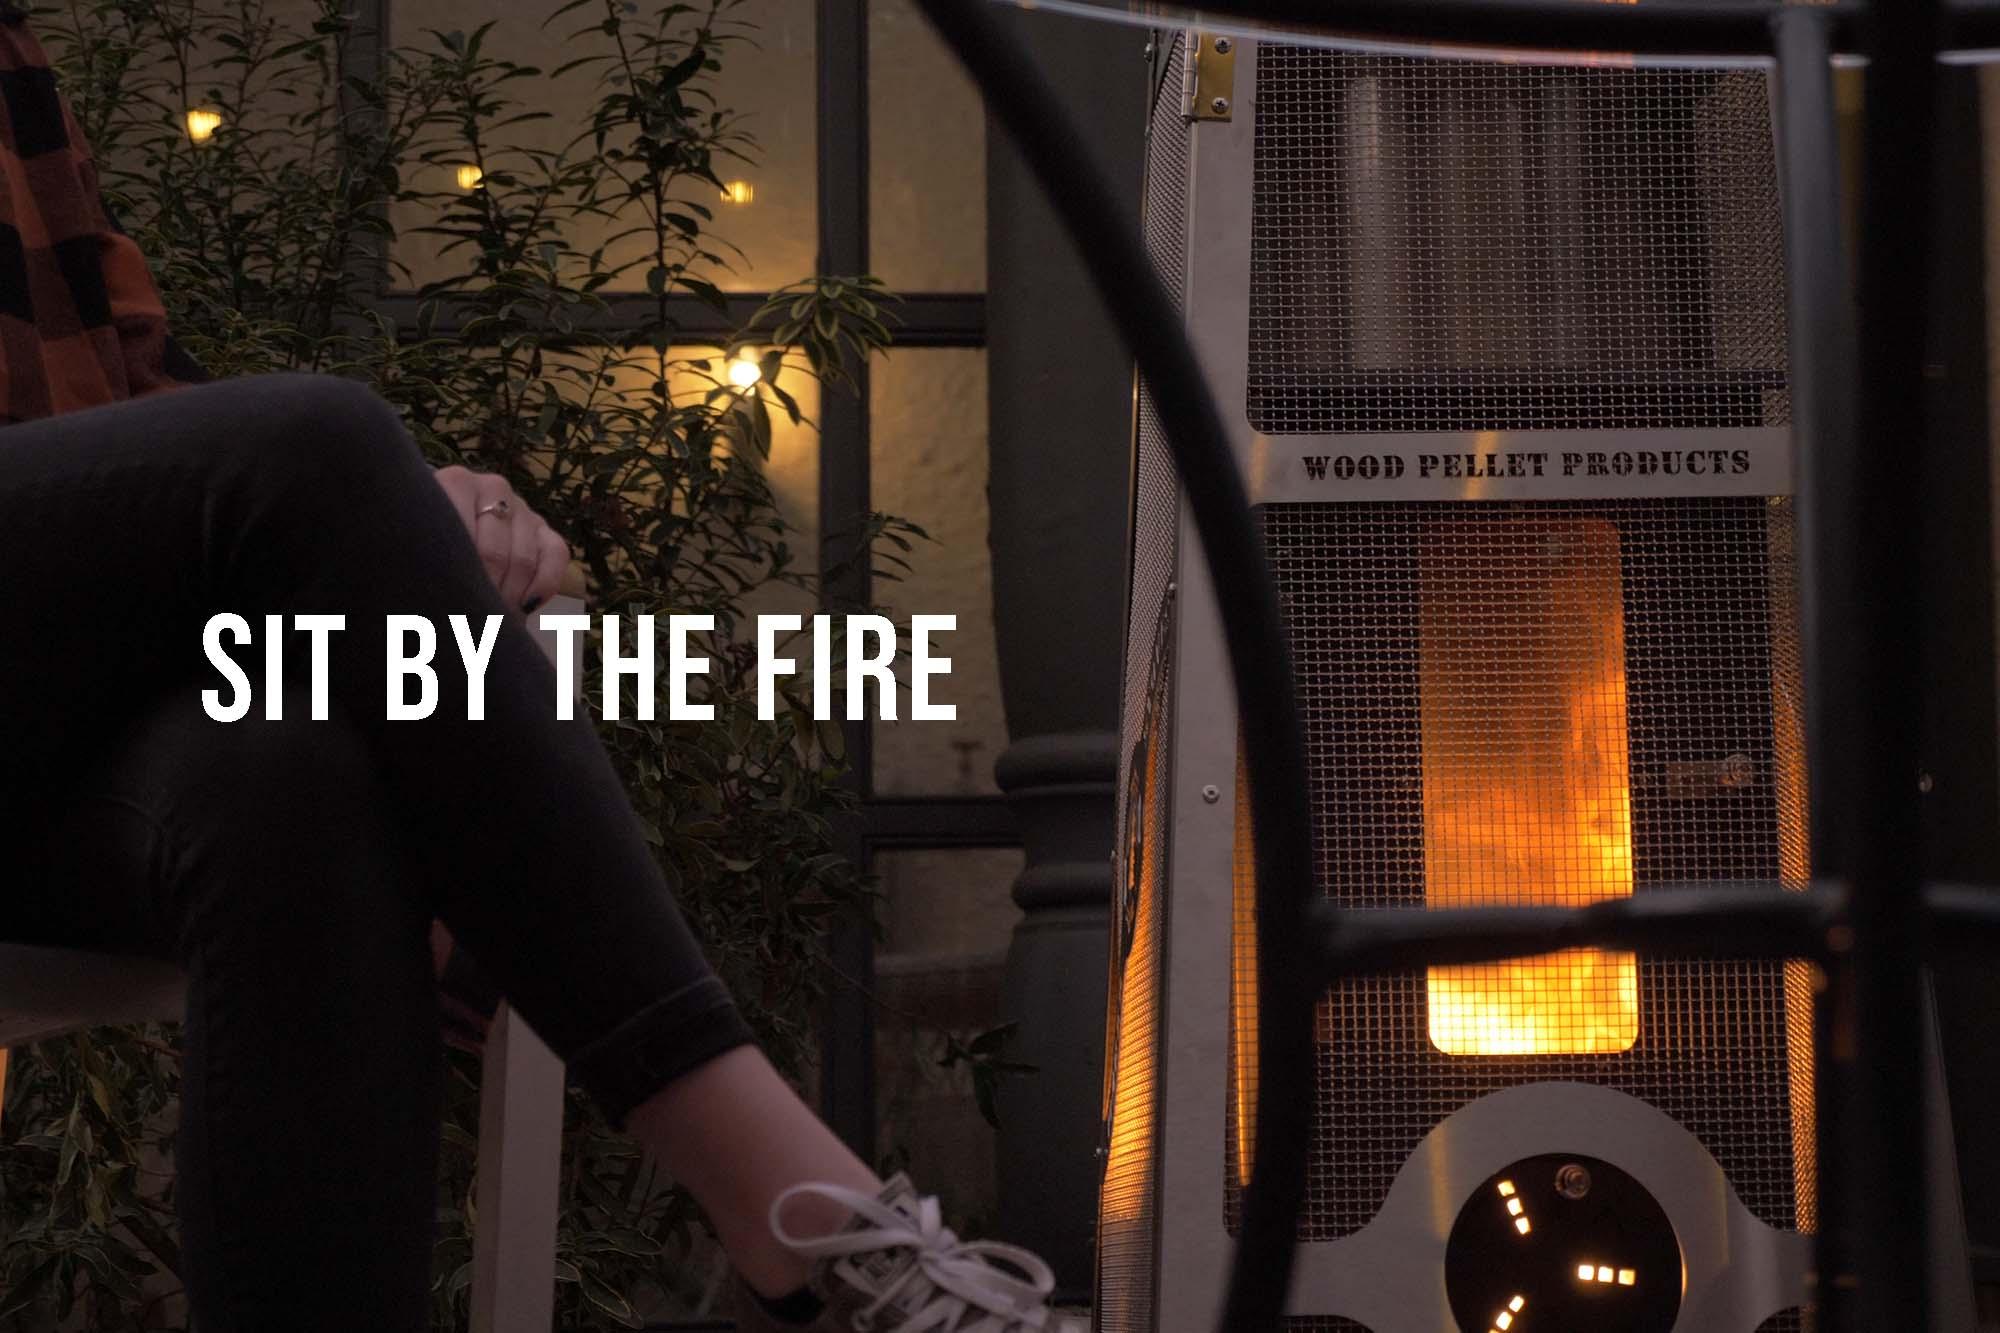 A wood pellet burning patio heater